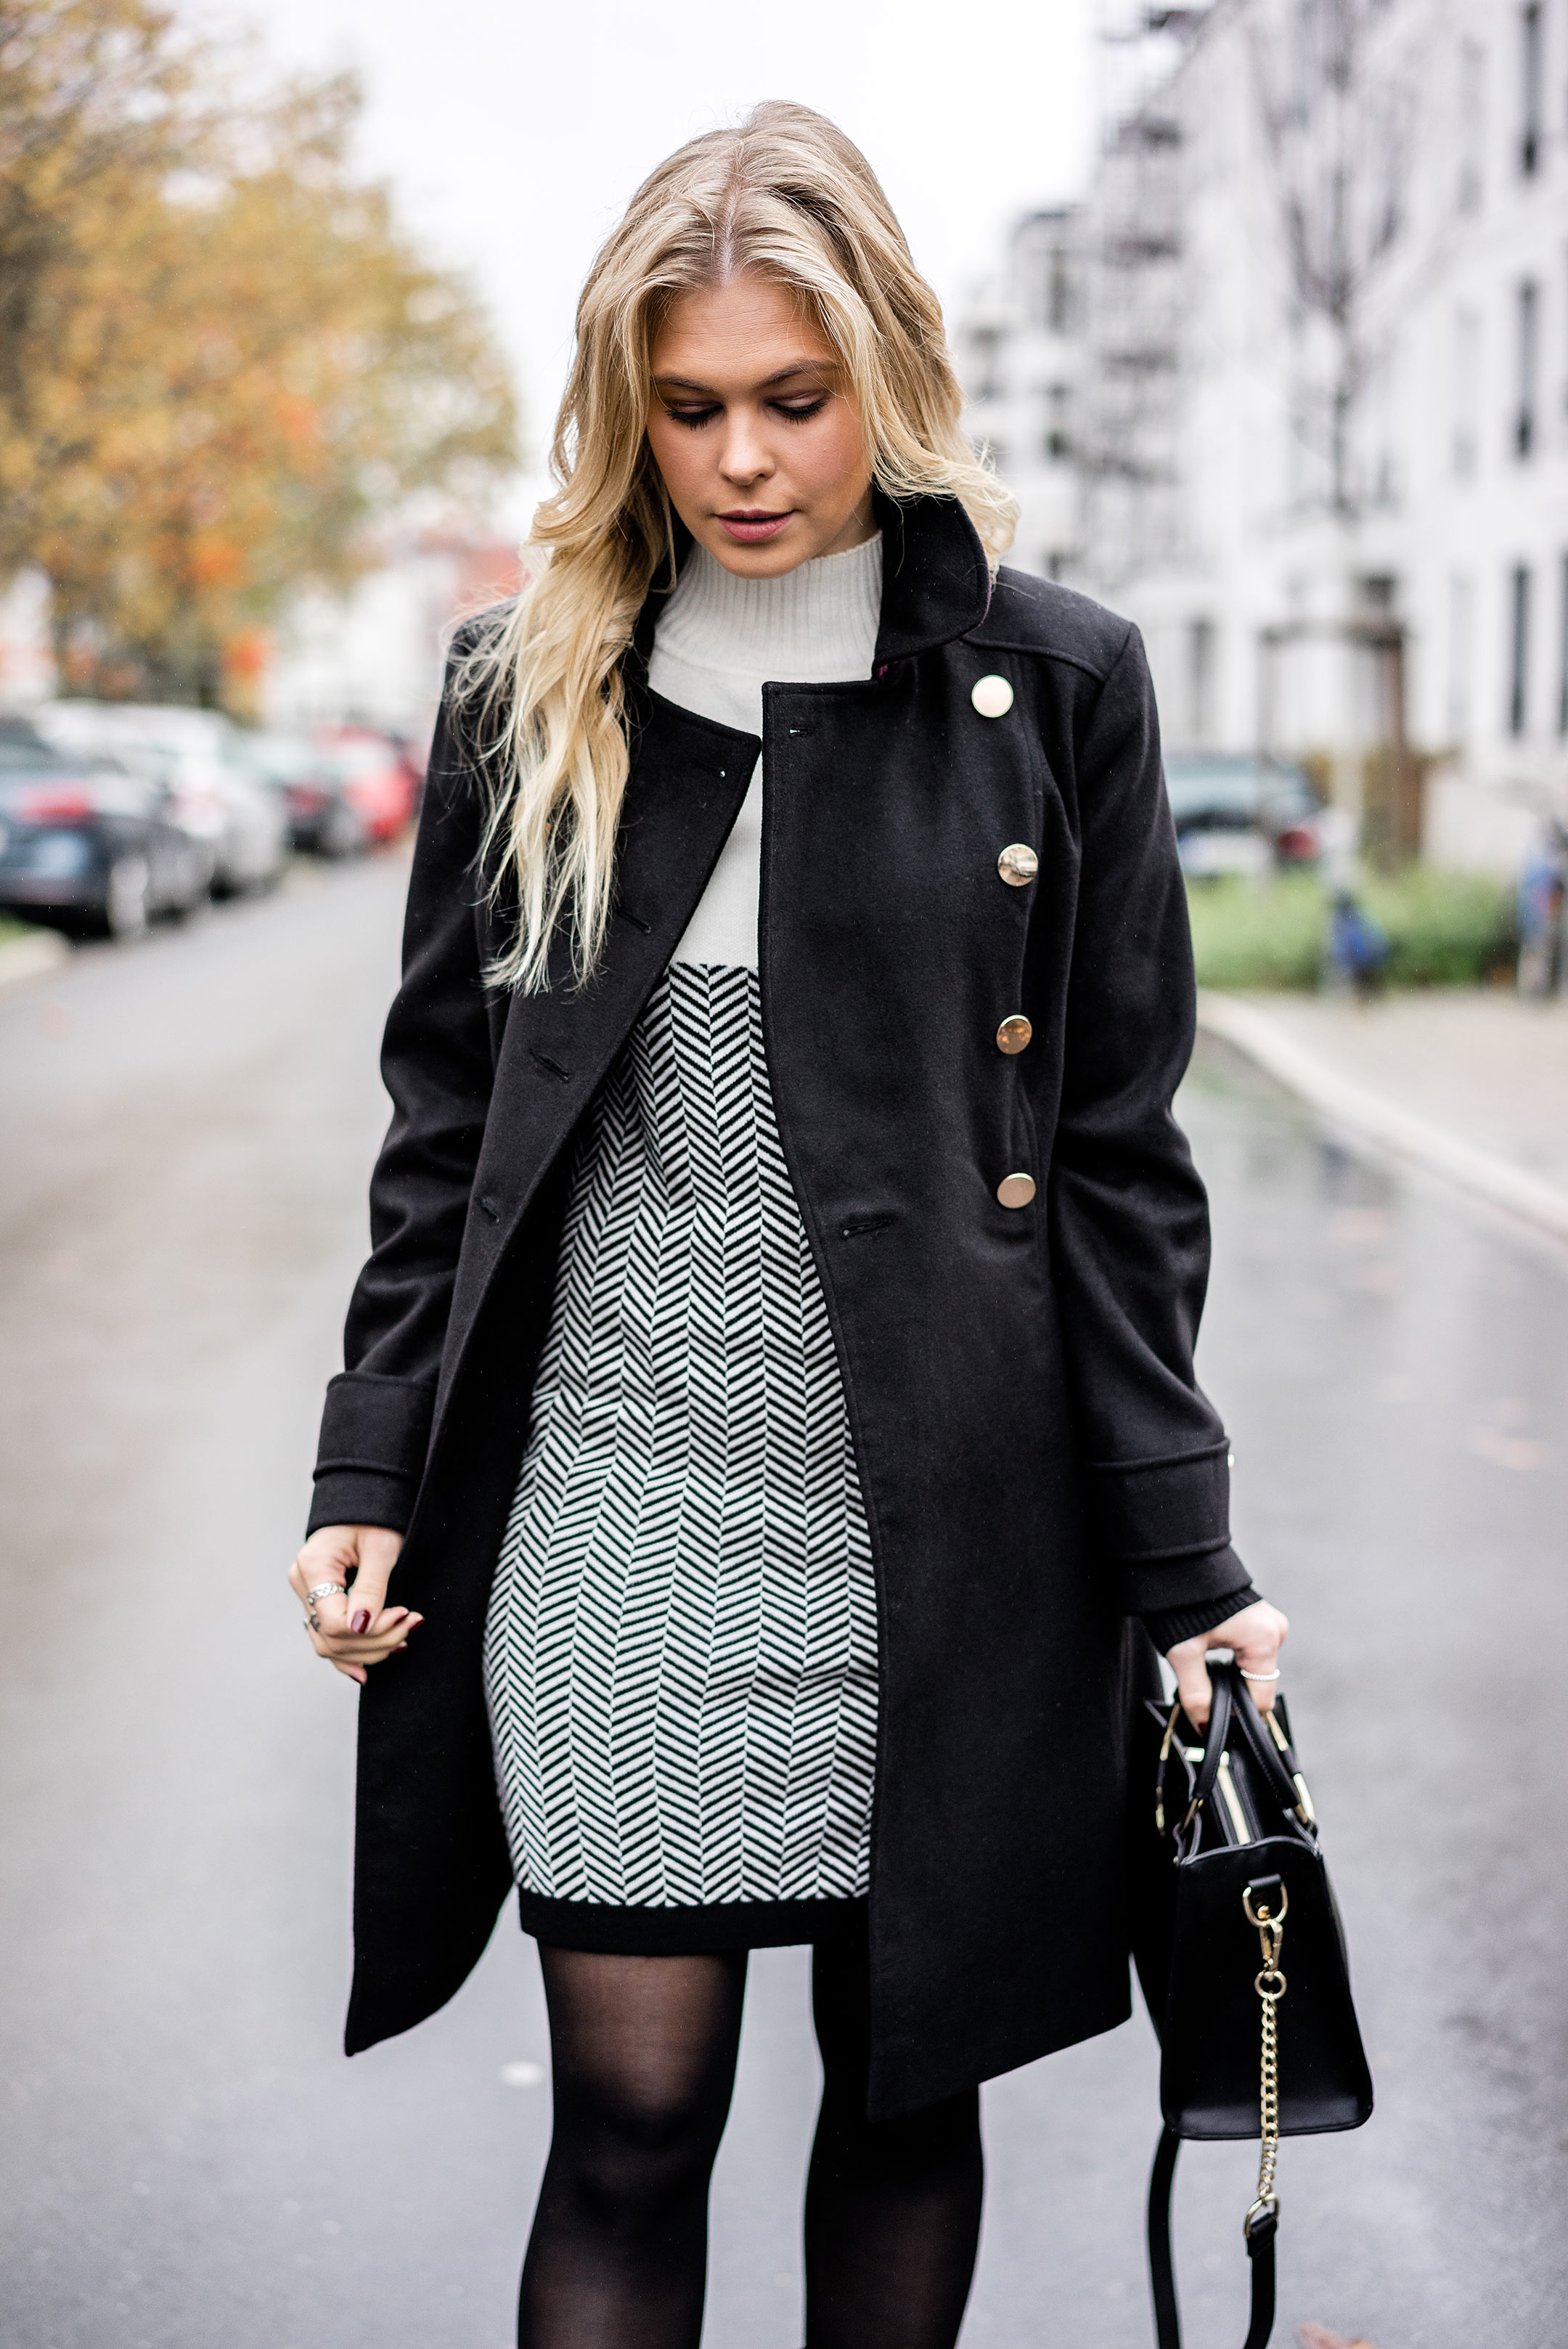 Sunnyinga Outfit Winterkleid Uniform Mantel Fashion Blogger Düsseldorf